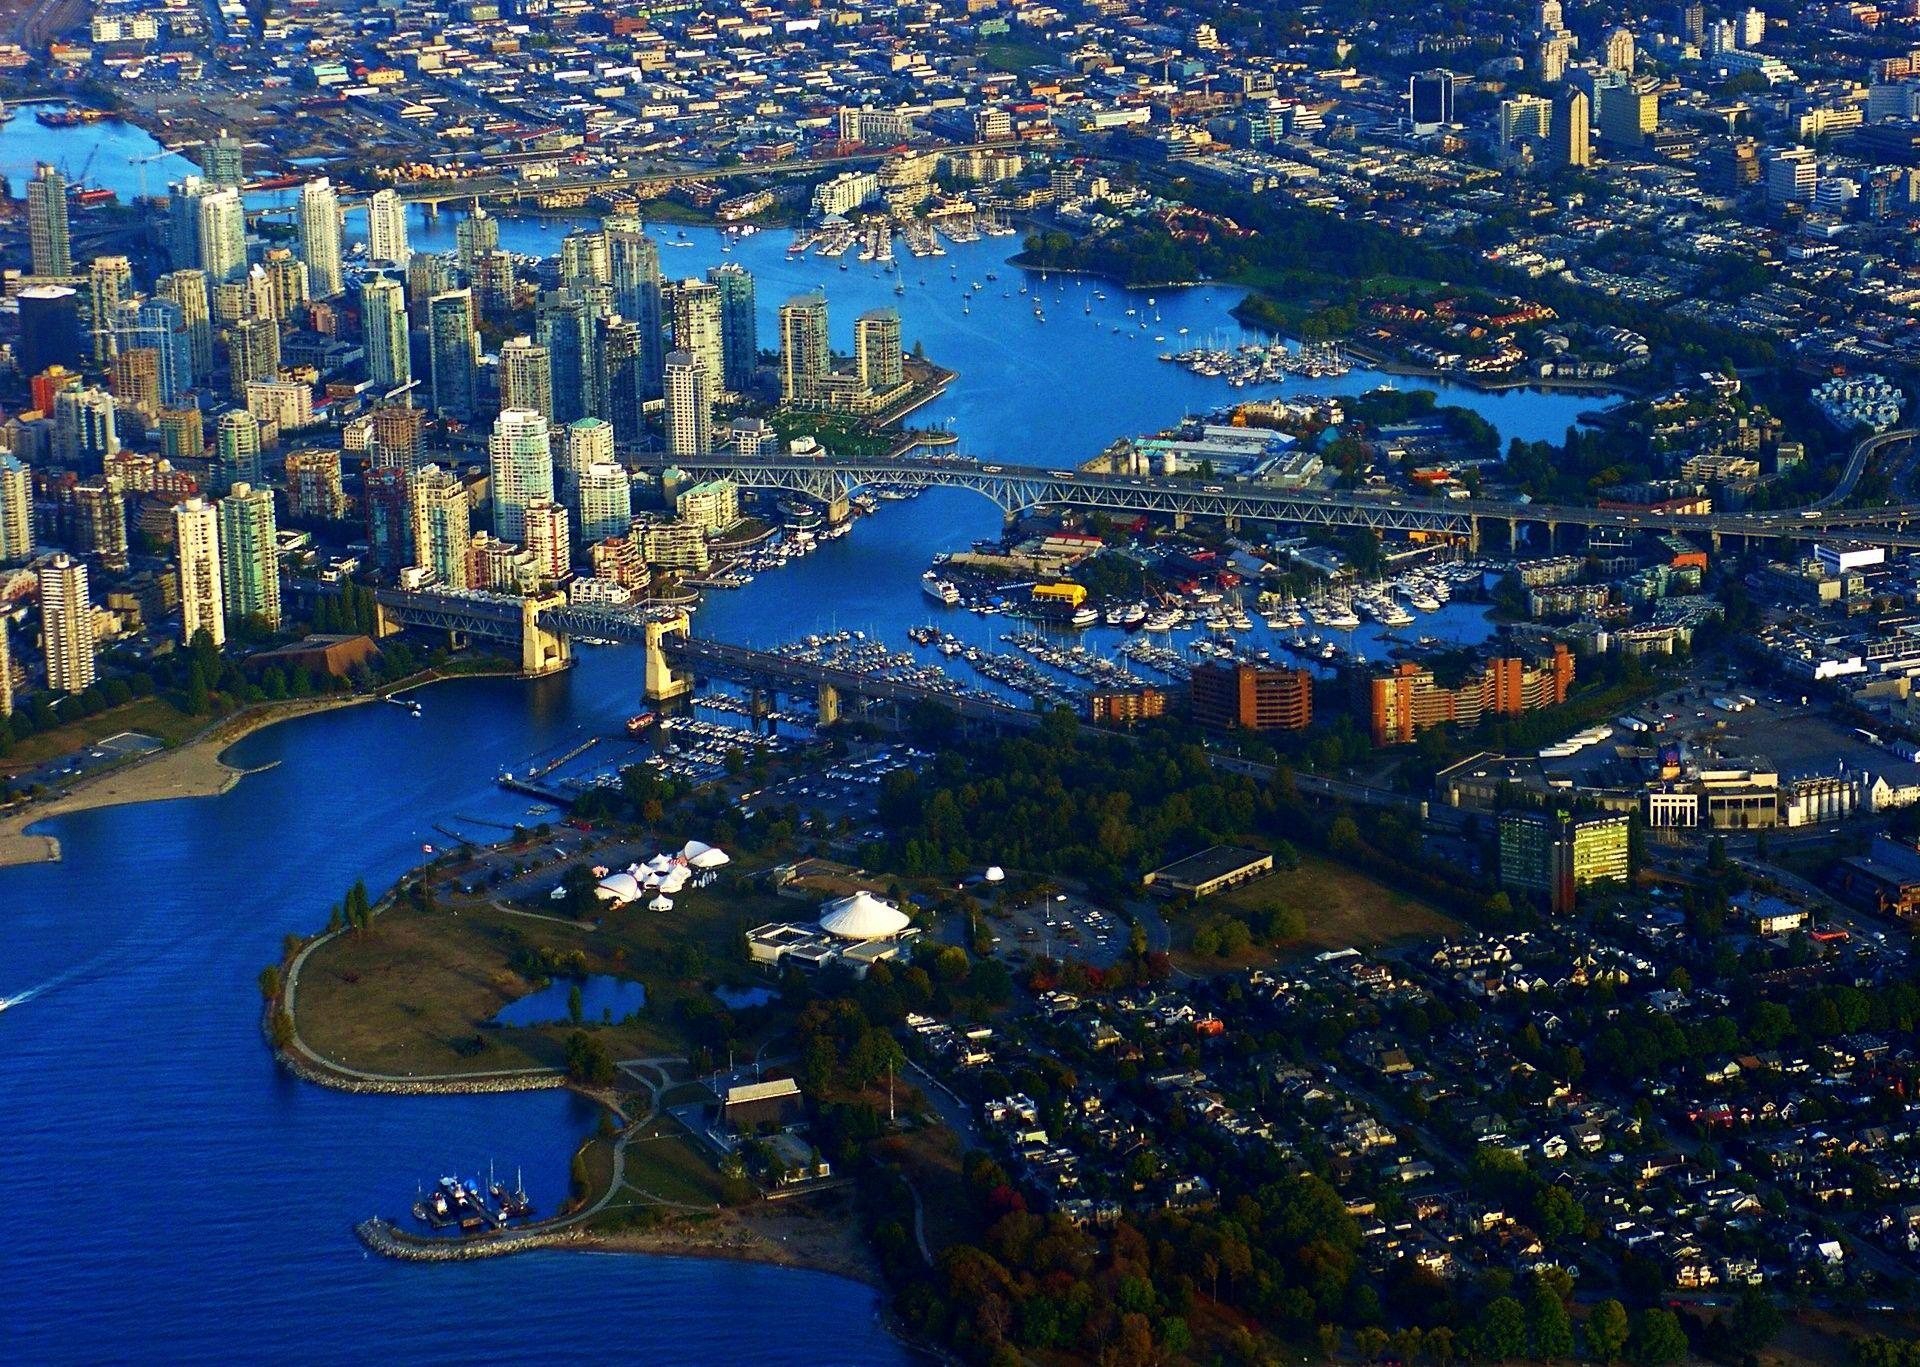 http://www.globeimages.net/data/media/3/bird_s_eye_view_of_vancouver__canada_.jpg